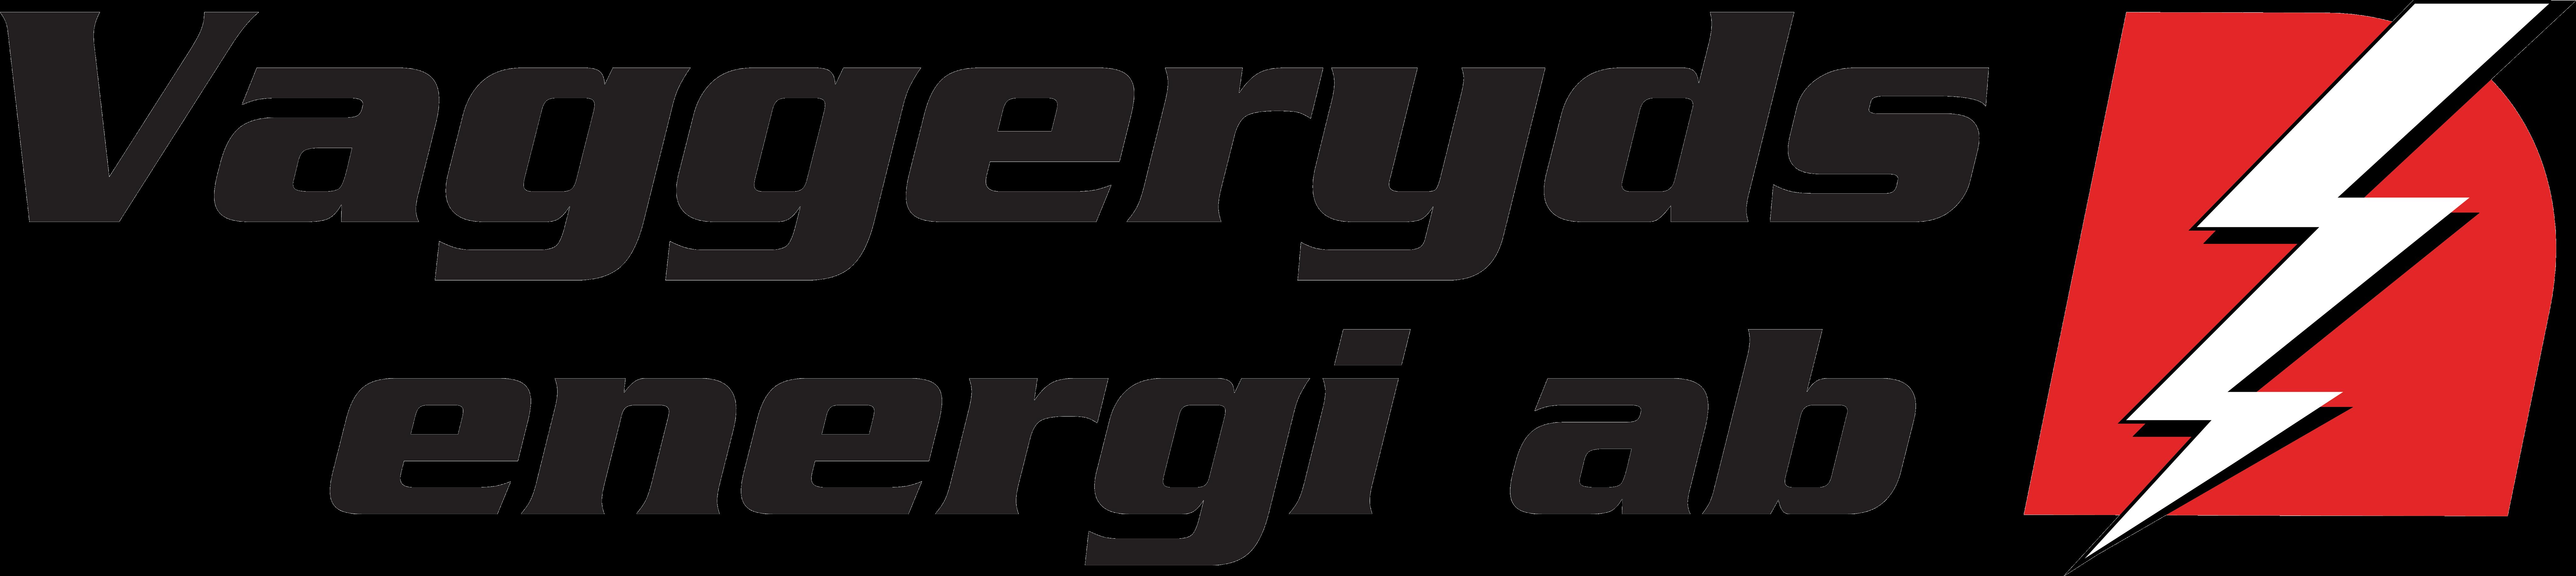 vaggeryds energi fiber